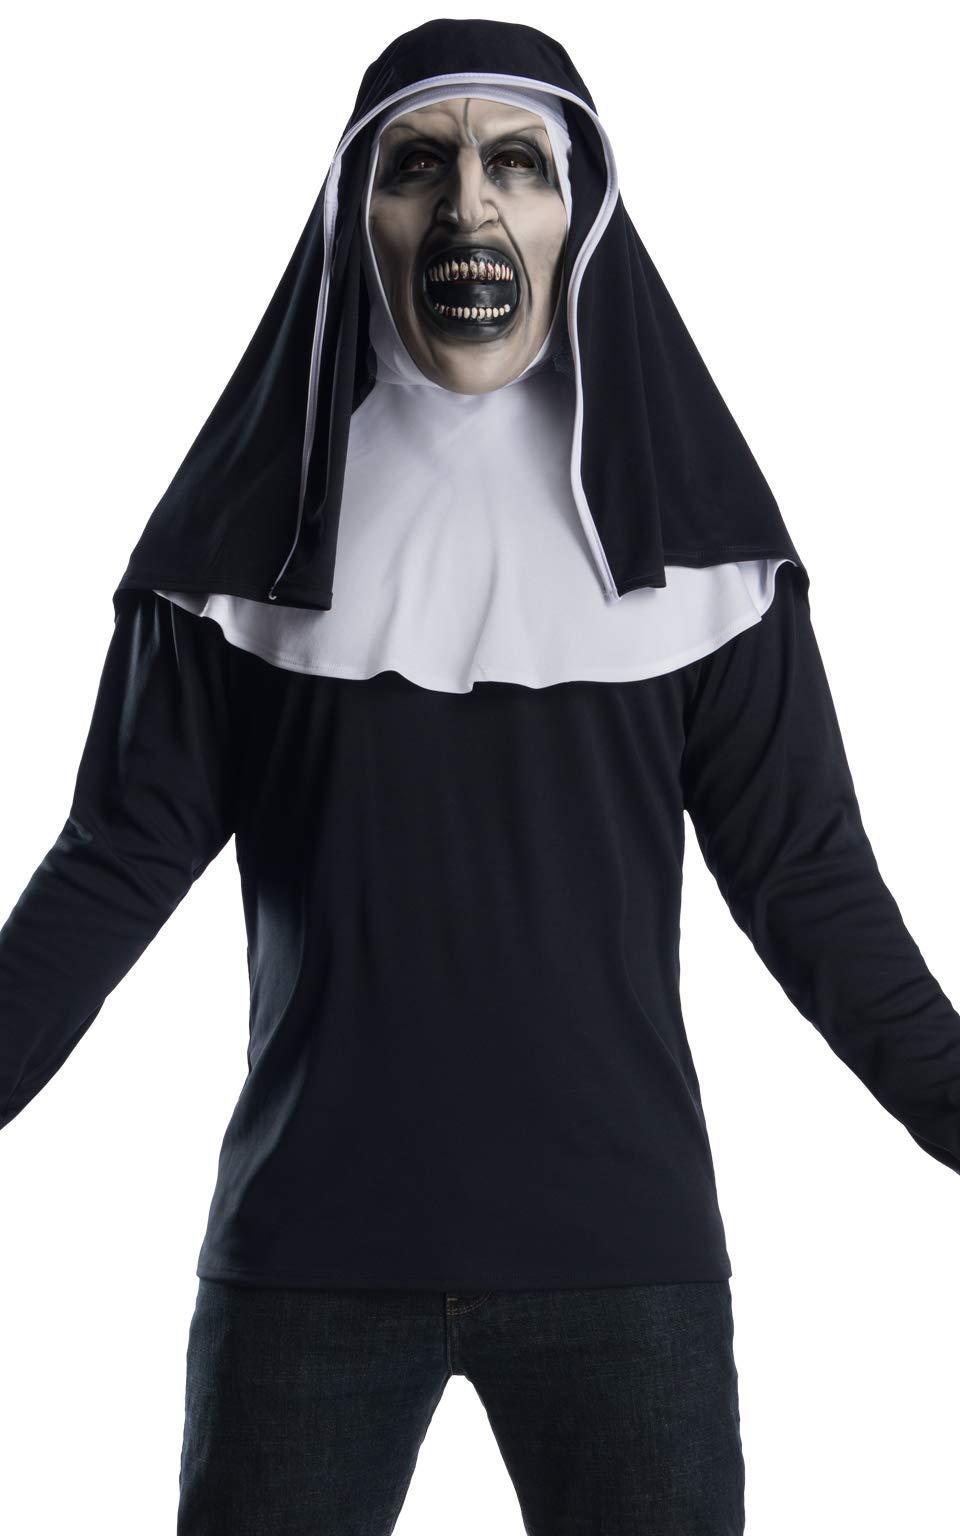 Rubie's The Nun映画婦人服トップス